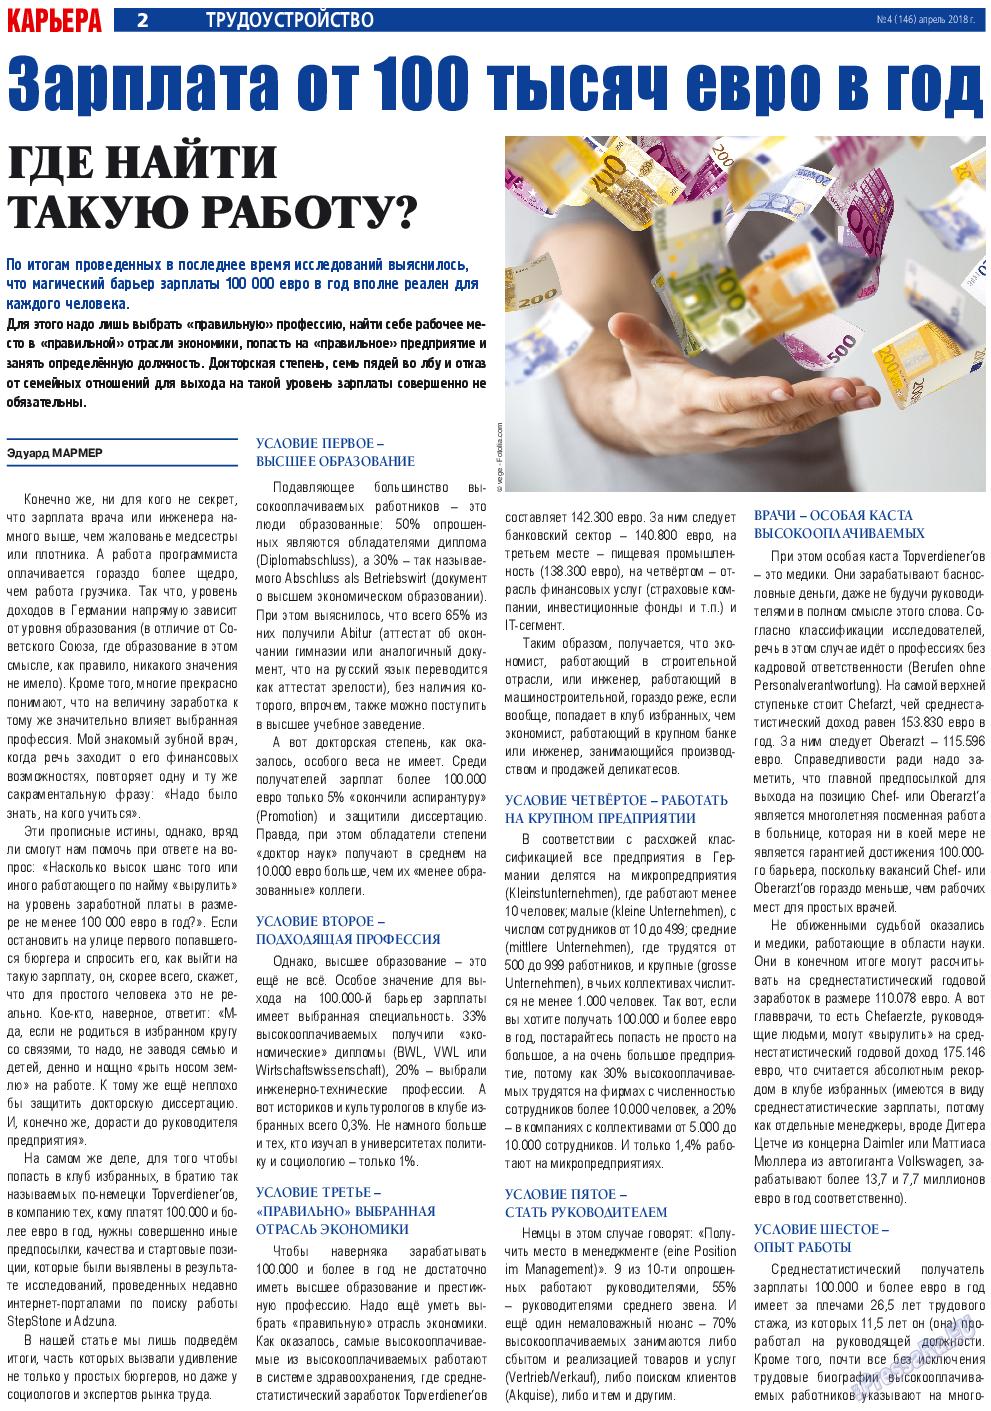 Карьера (газета). 2018 год, номер 4, стр. 2